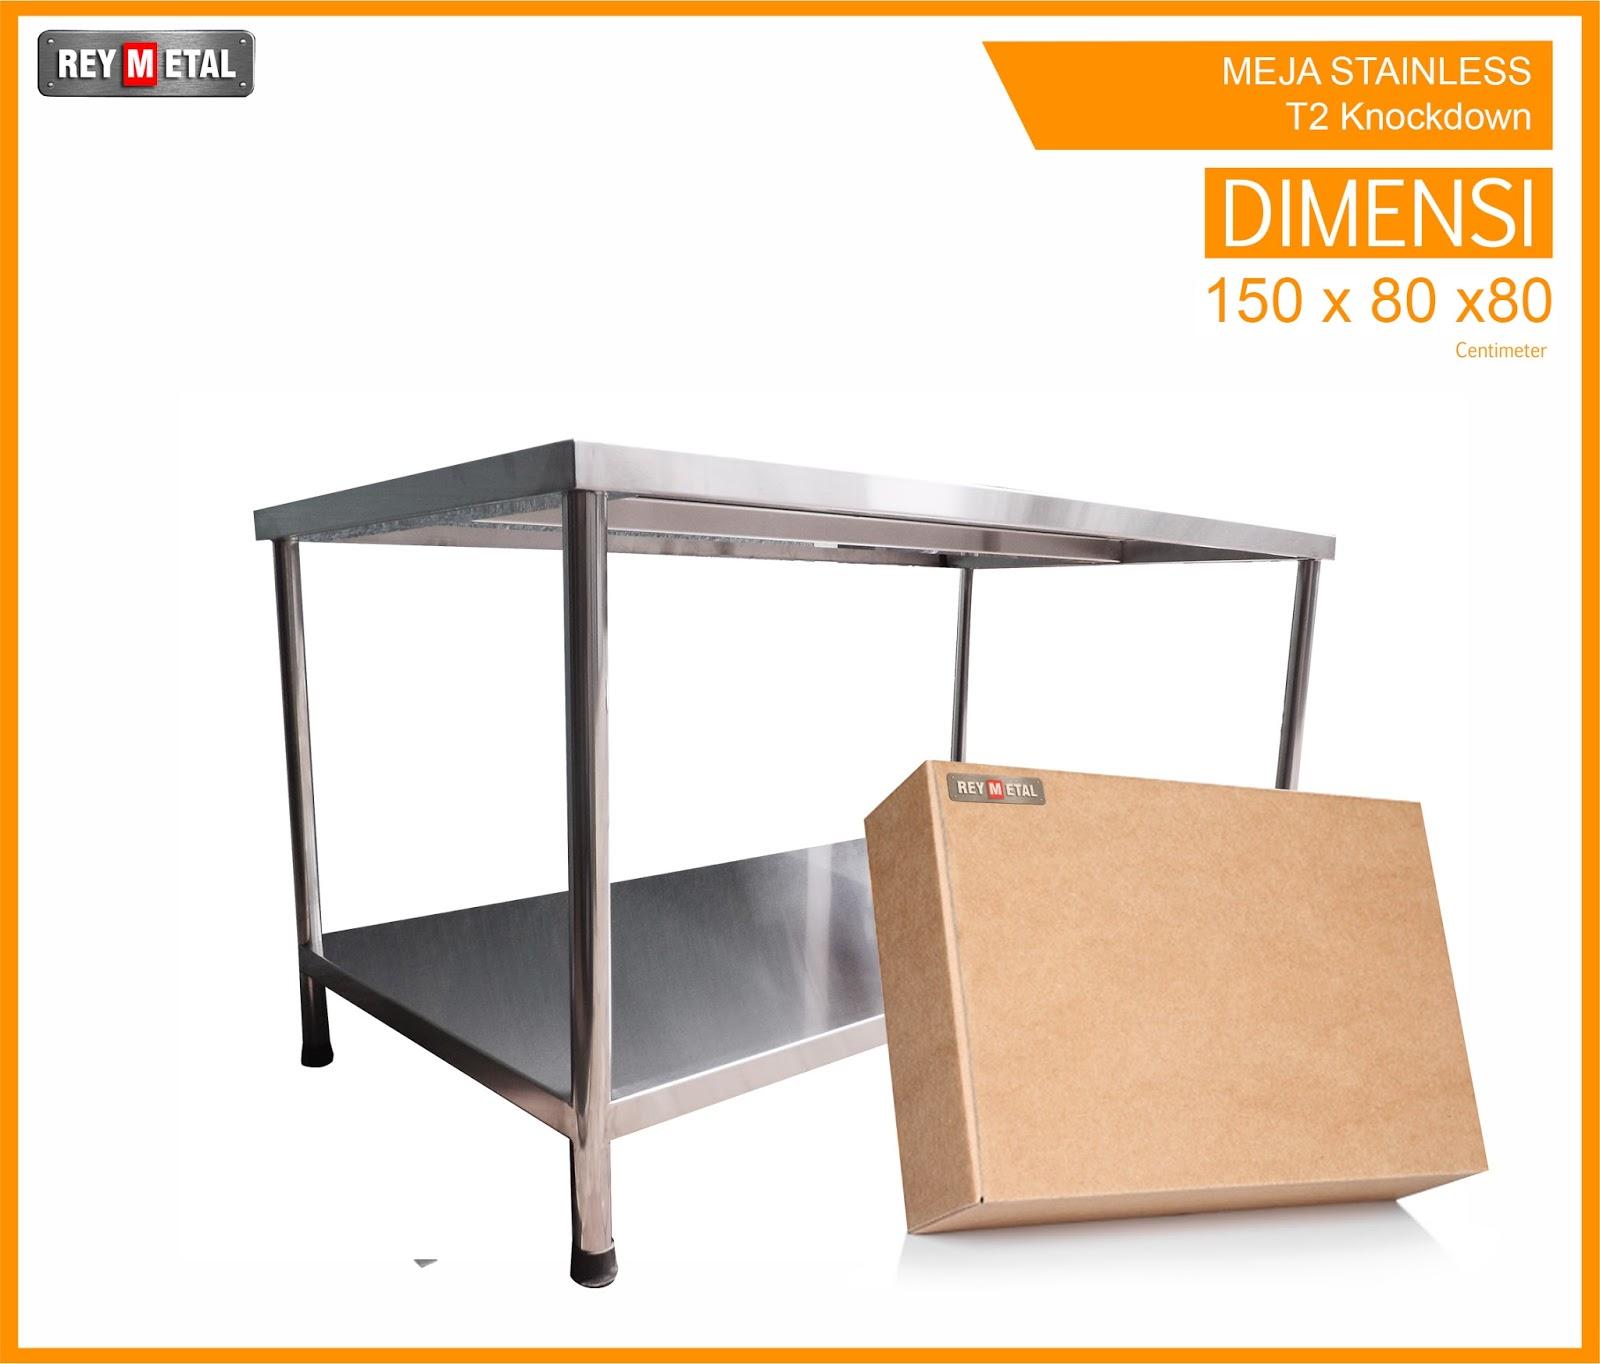 Kitchen Set Stainless Steel Murah: Jual Meja Stainless Kirim Seluruh Indonesia